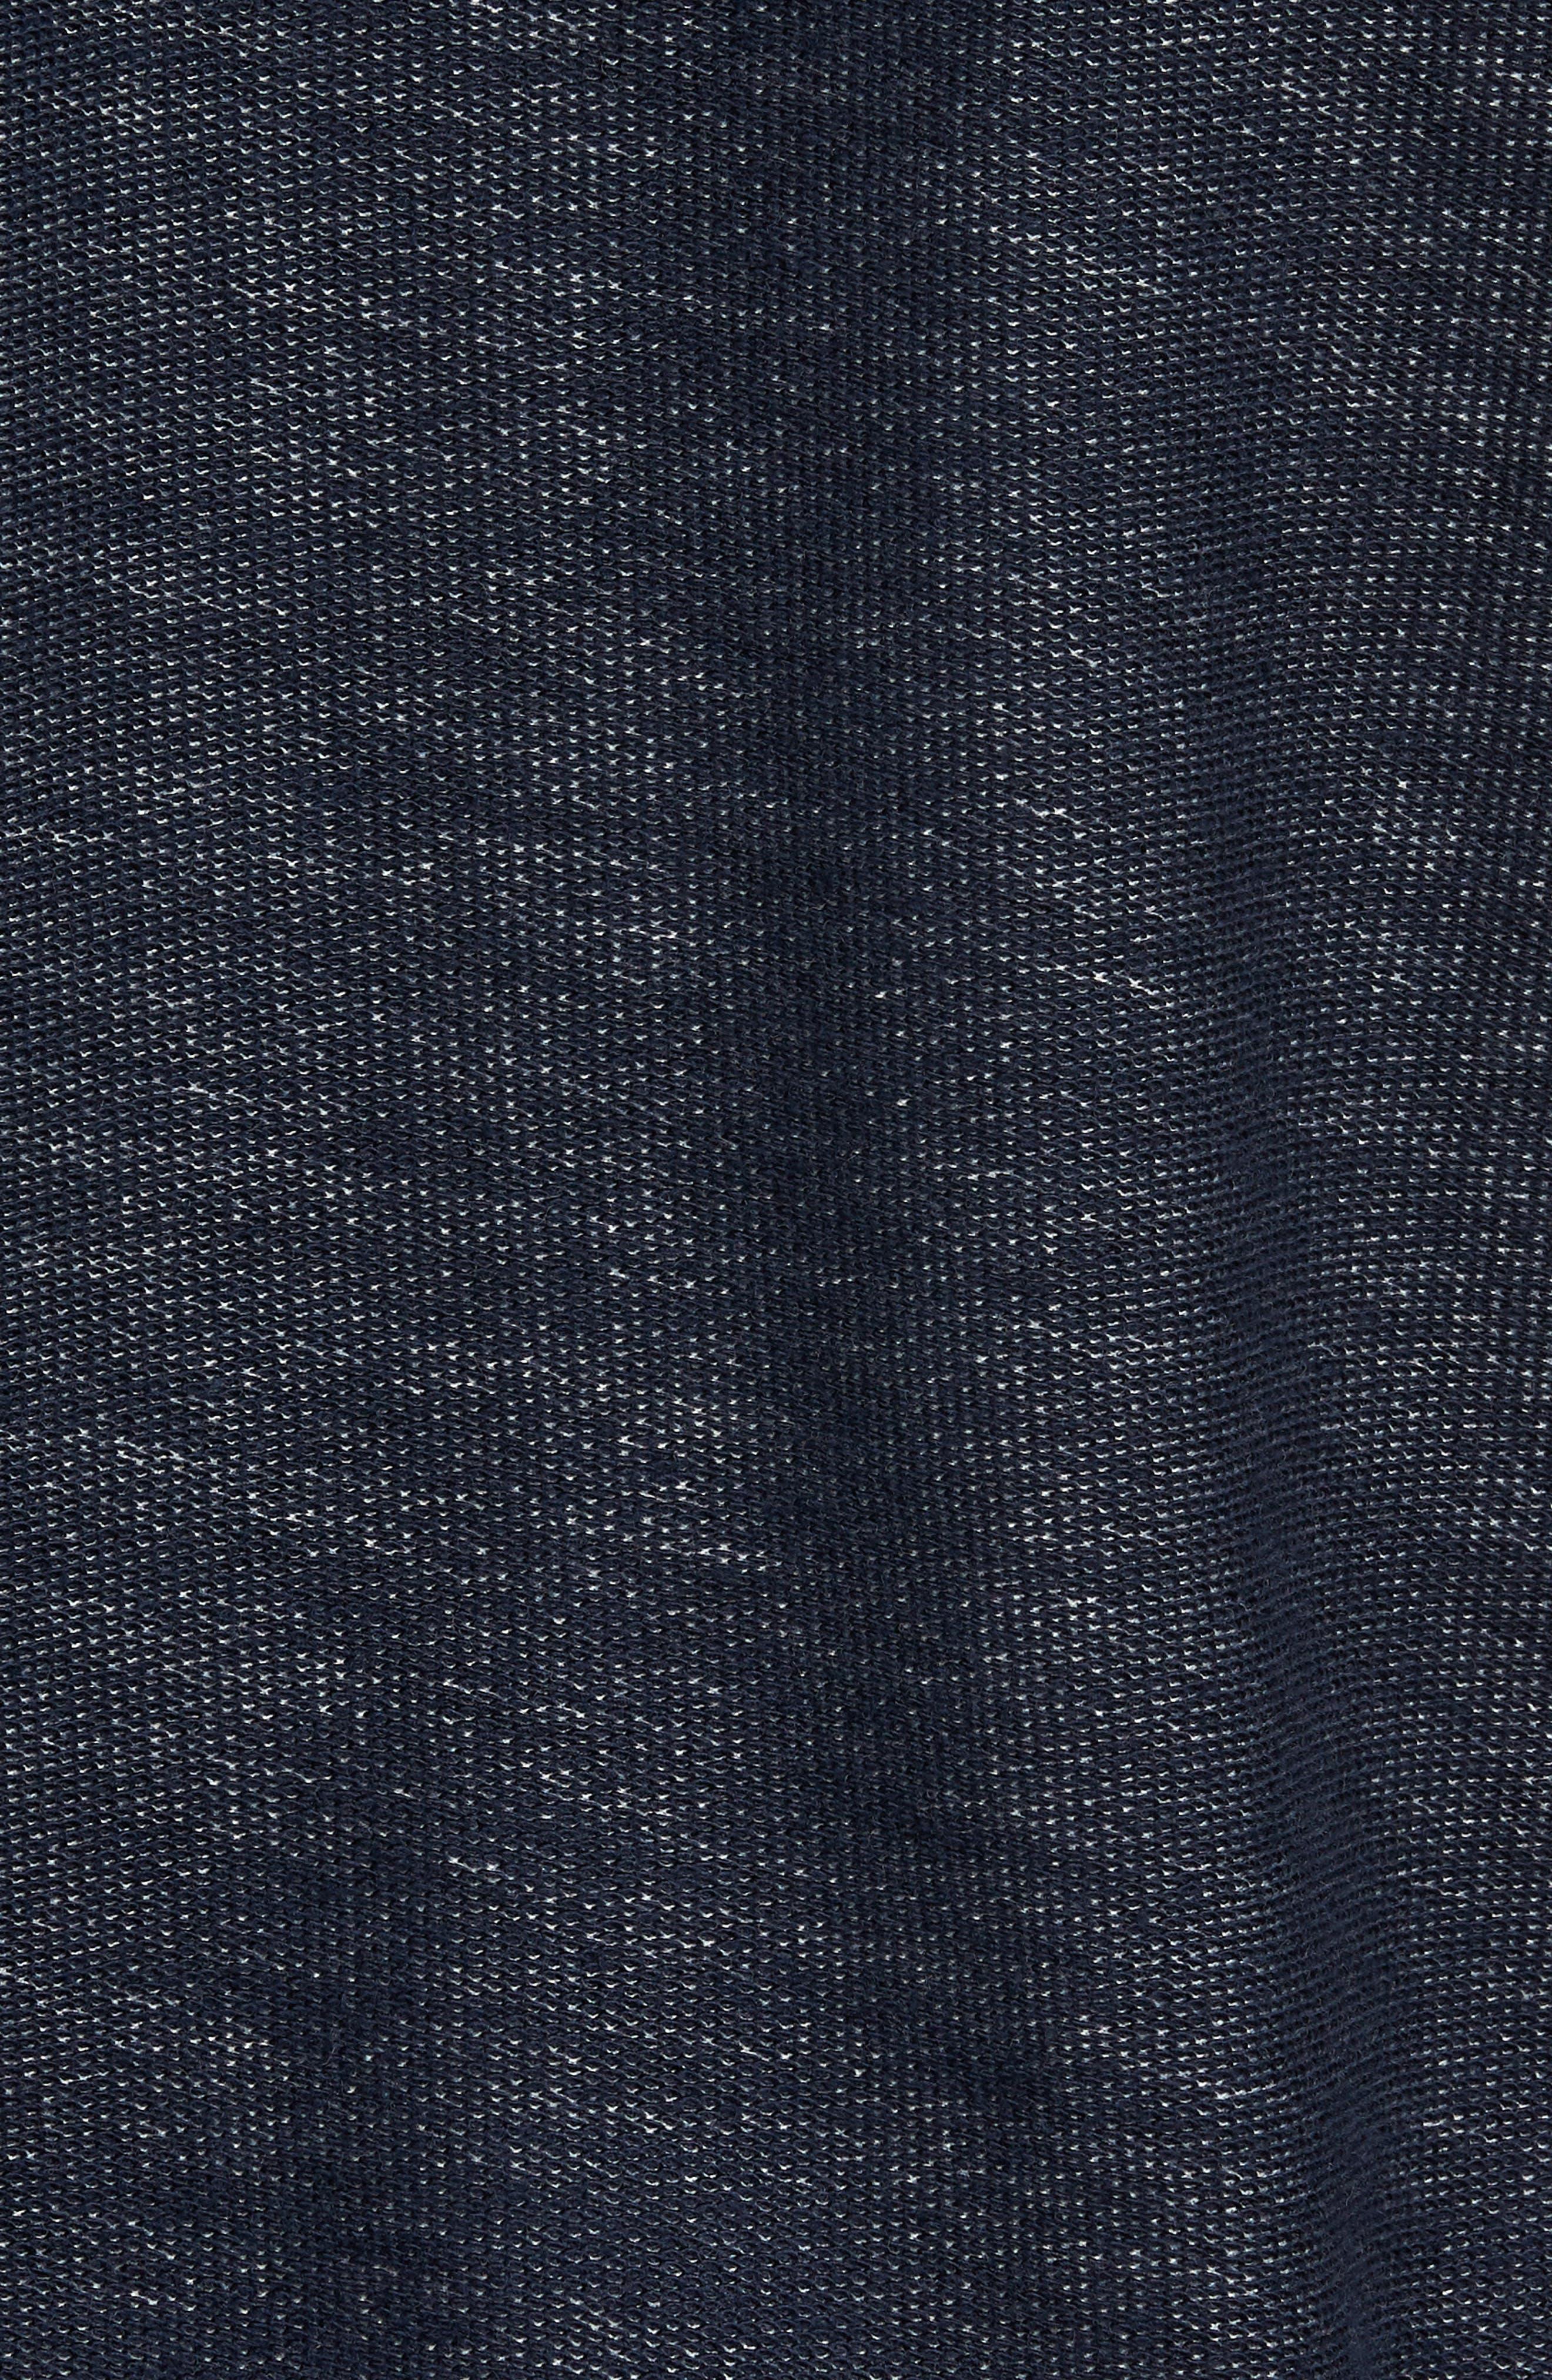 Reversible Colorblock Terry Sweatshirt,                             Alternate thumbnail 3, color,                             Navy / Grey